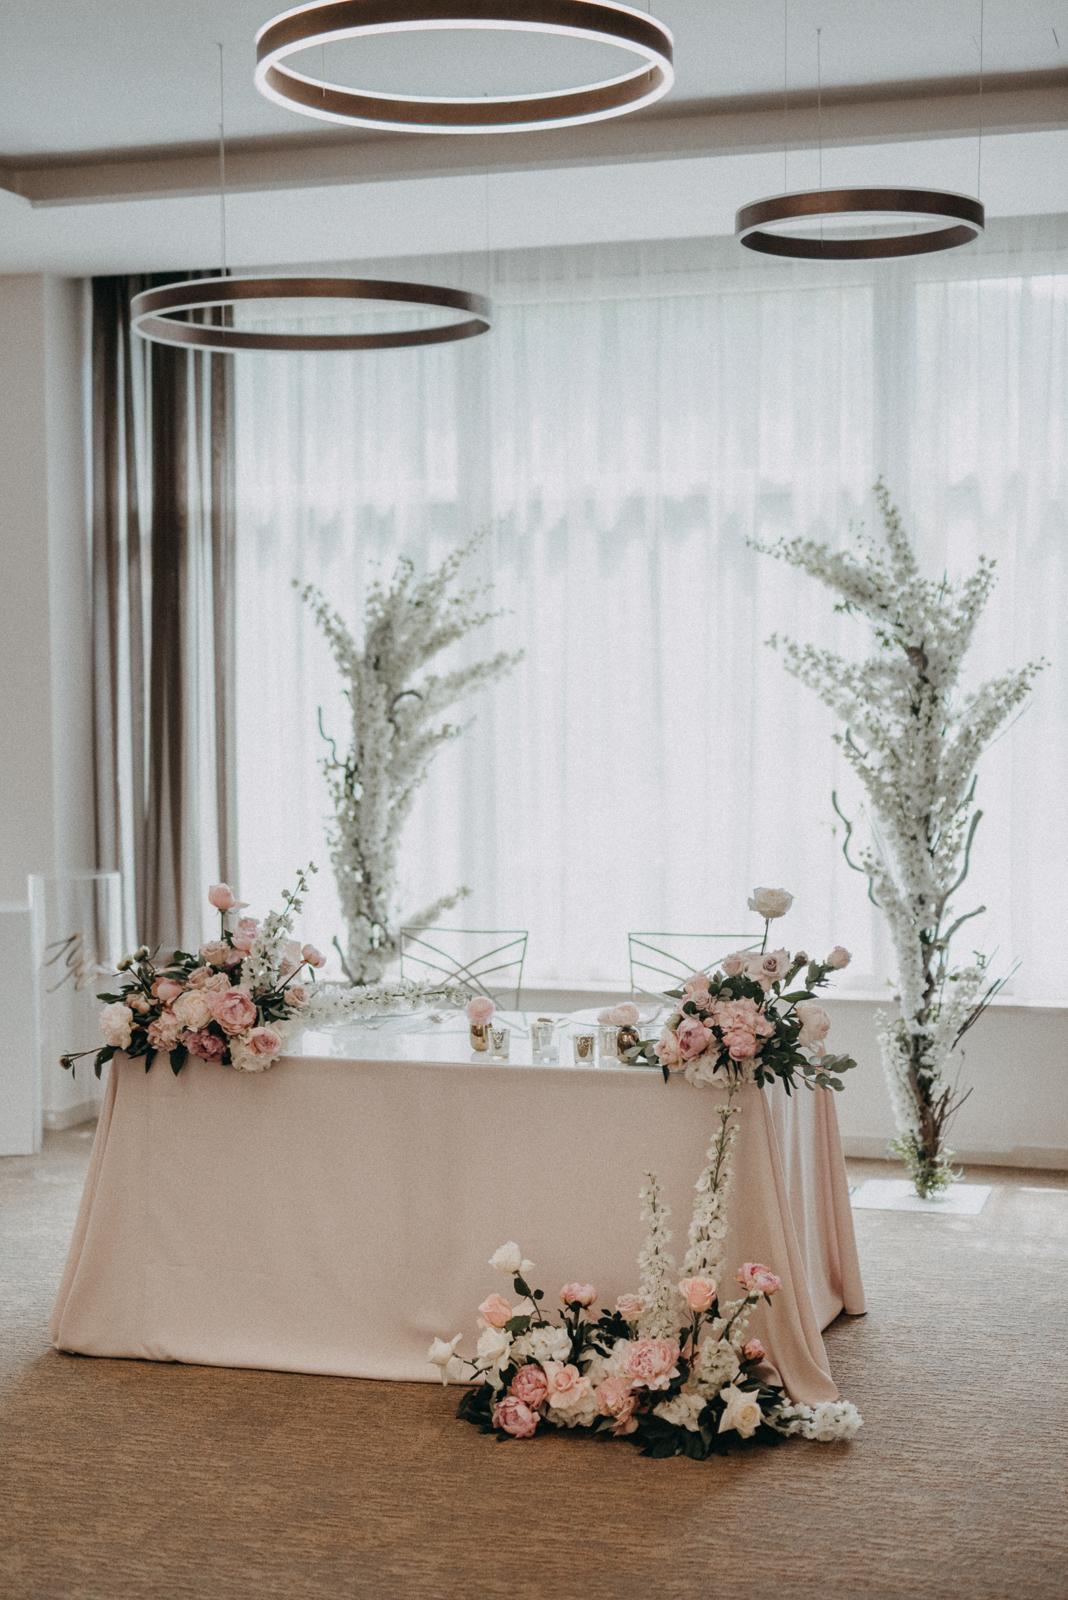 terezaklizanova_weddings - Obrázok č. 3